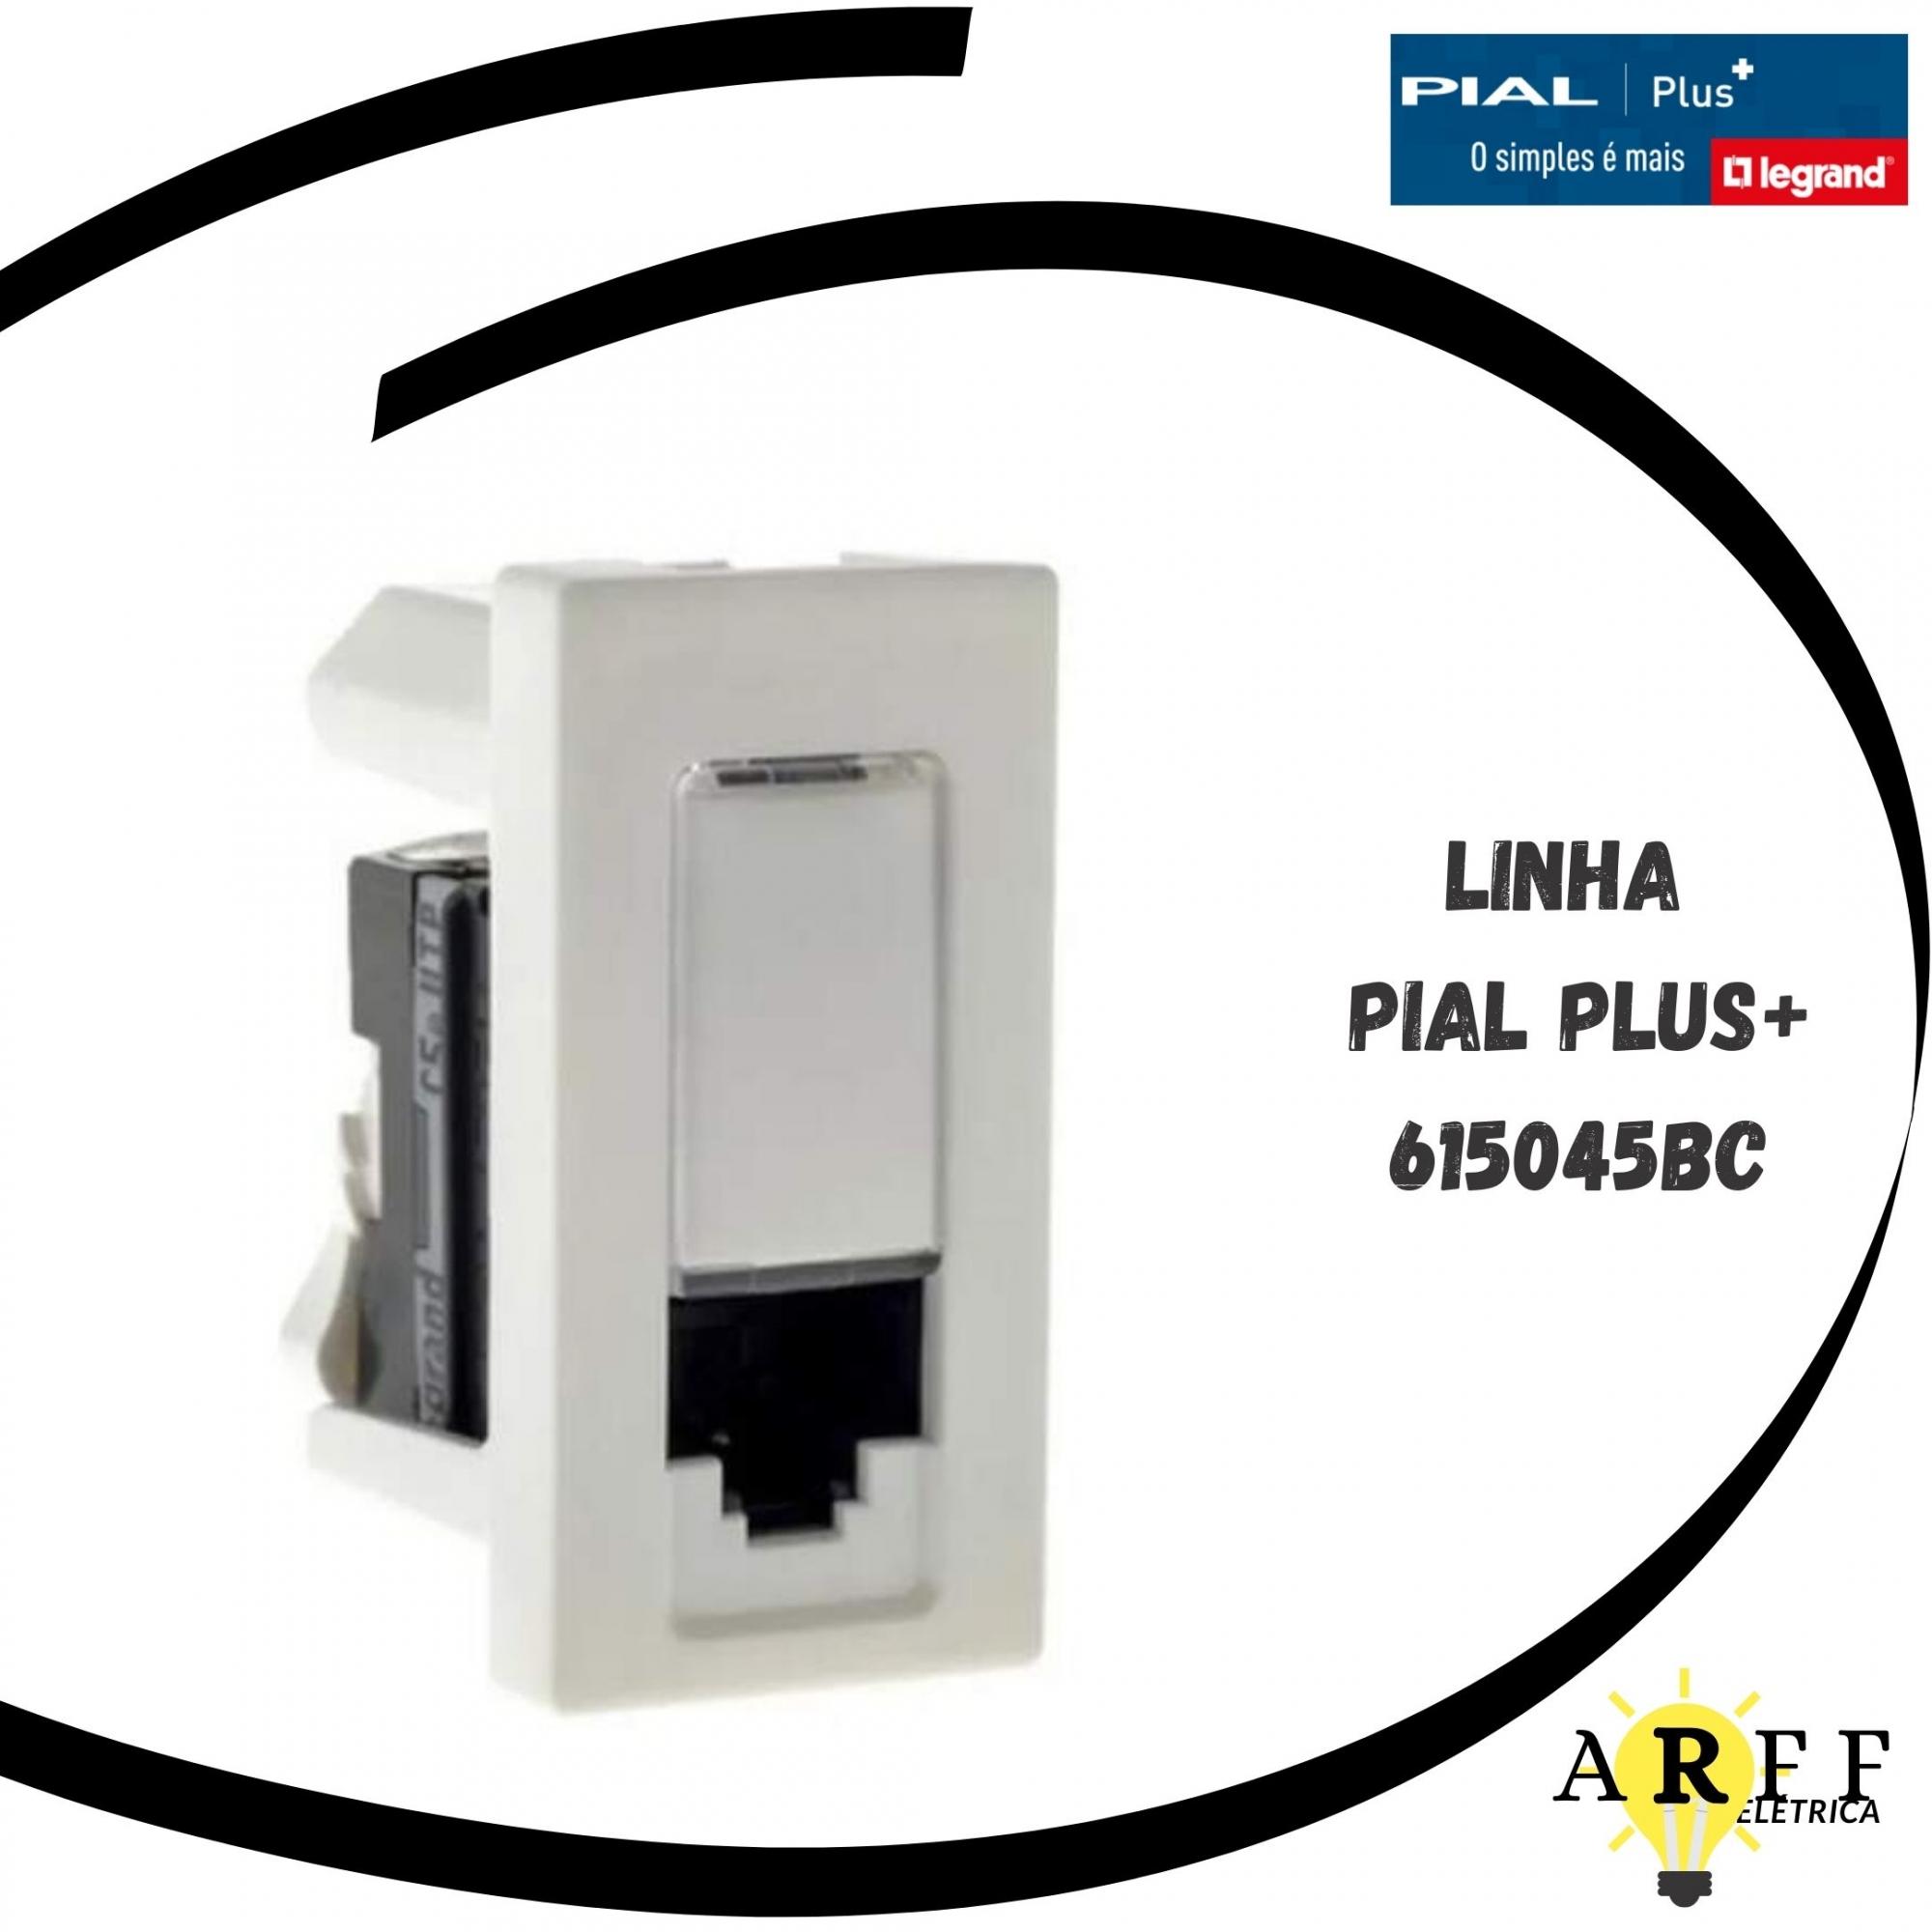 615045BC - Tomada de Dados LCS2 RJ45 CATSE PialPlus+